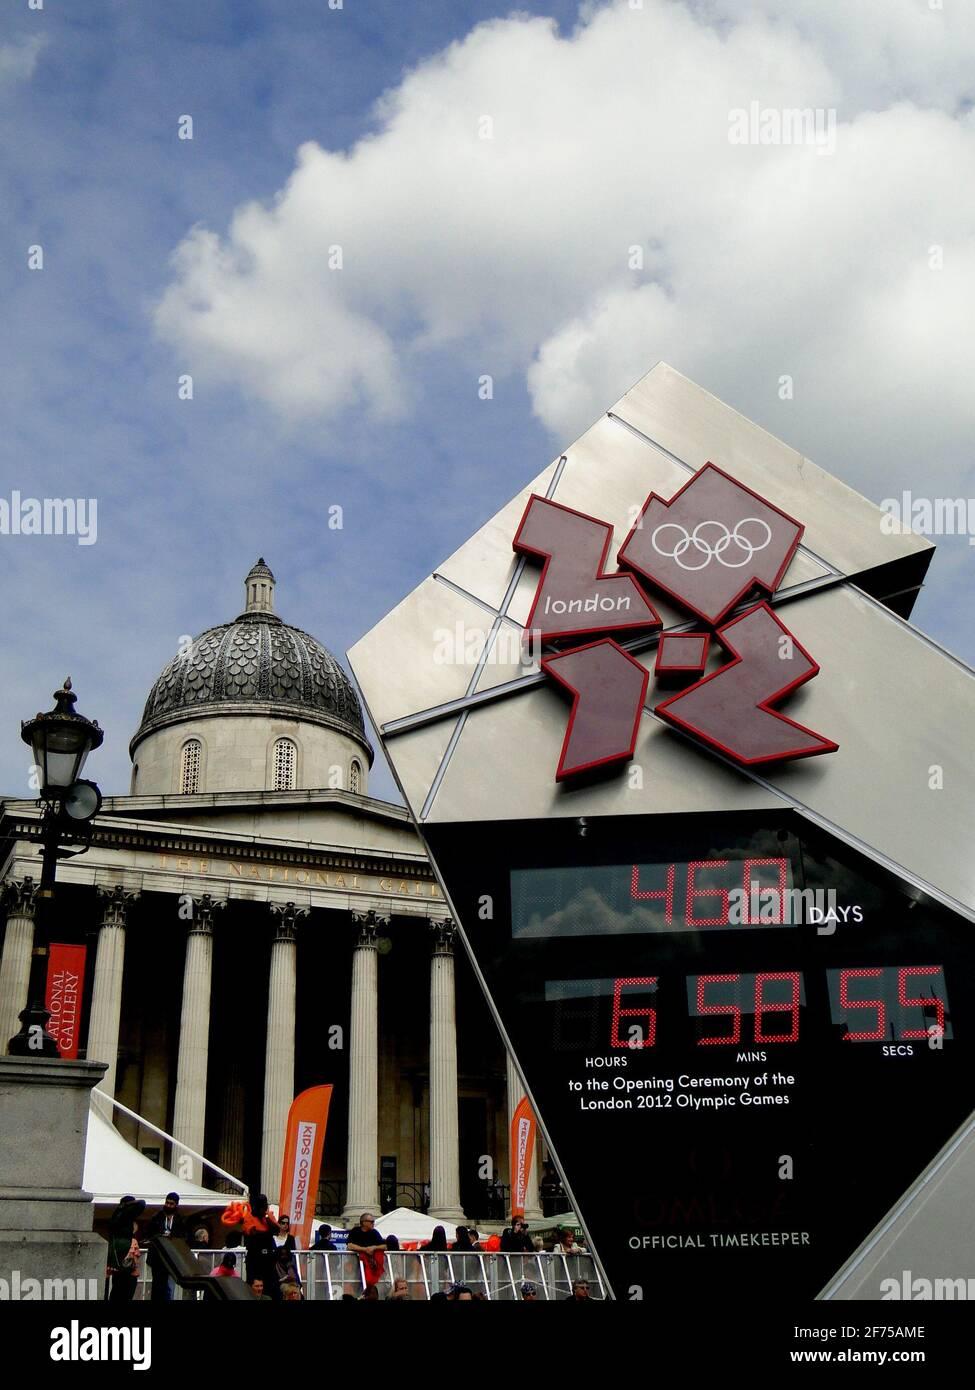 Logo watches of London's Olympic games set up on Trafalgar square in London, UK Stock Photo